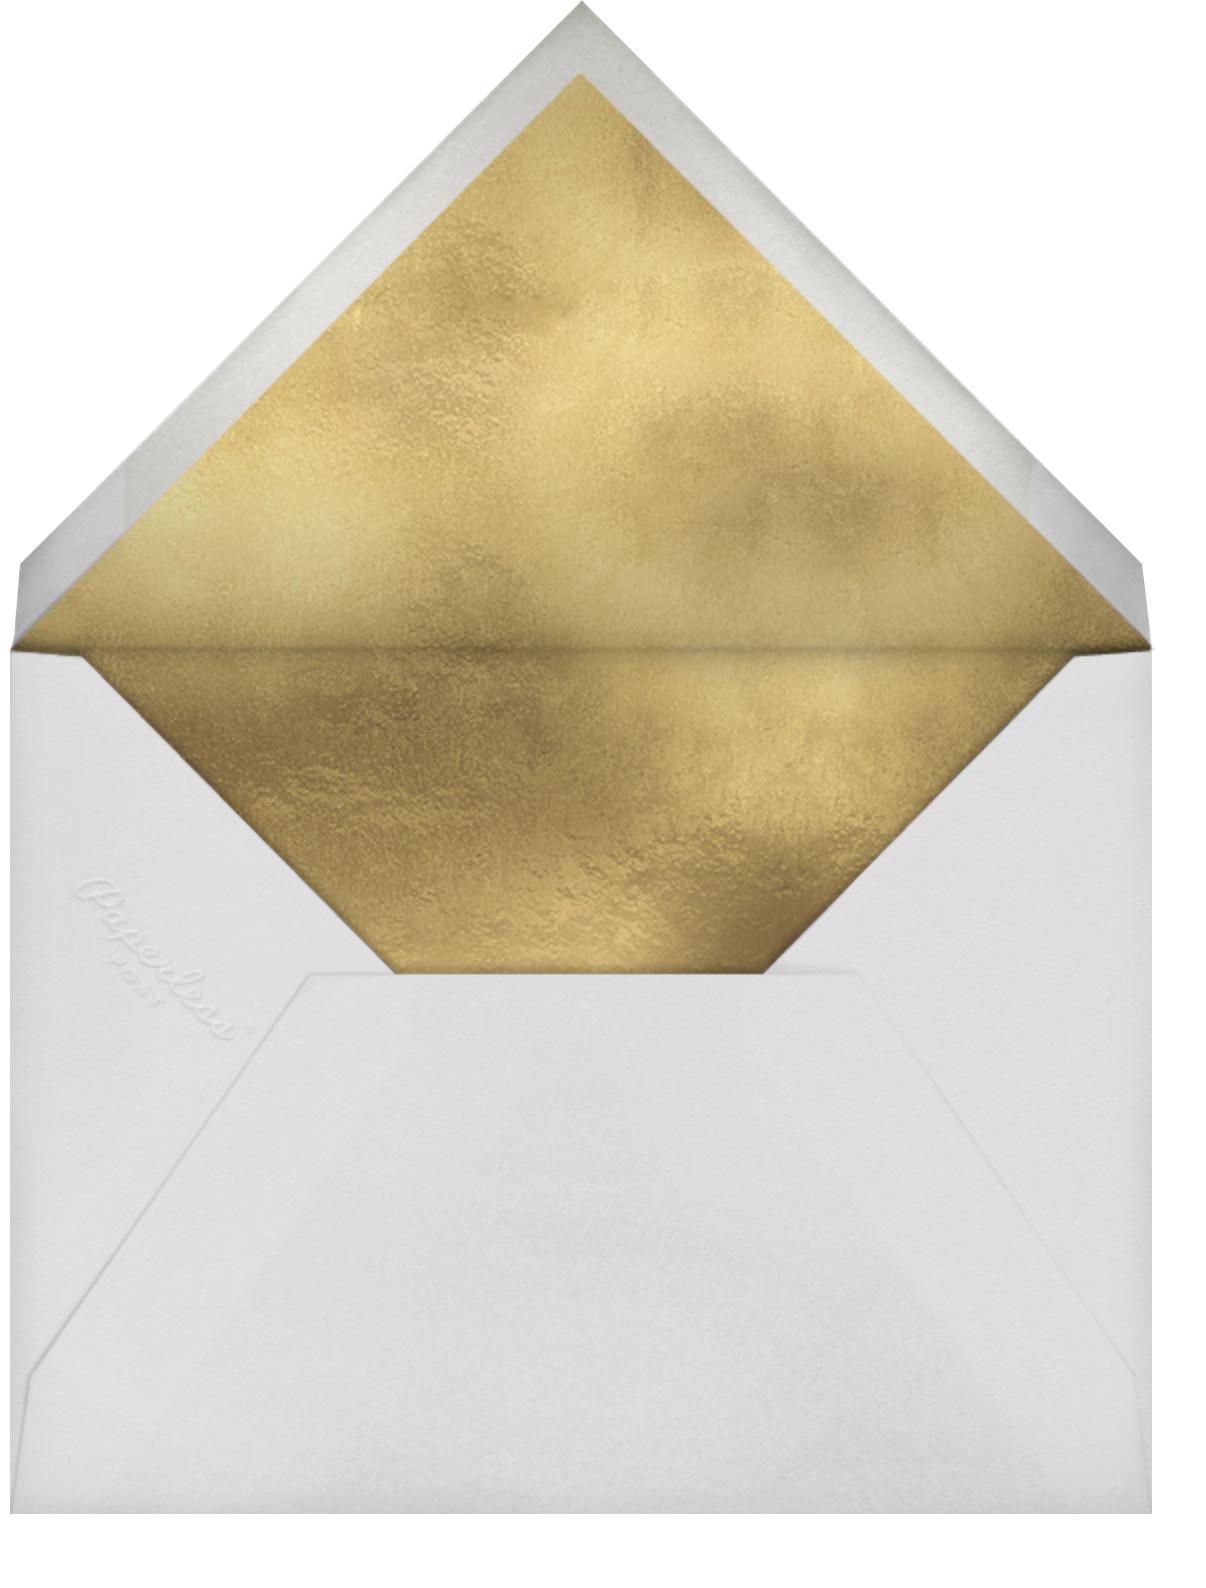 Shake Things Up - Mr. Boddington's Studio - Christmas party - envelope back